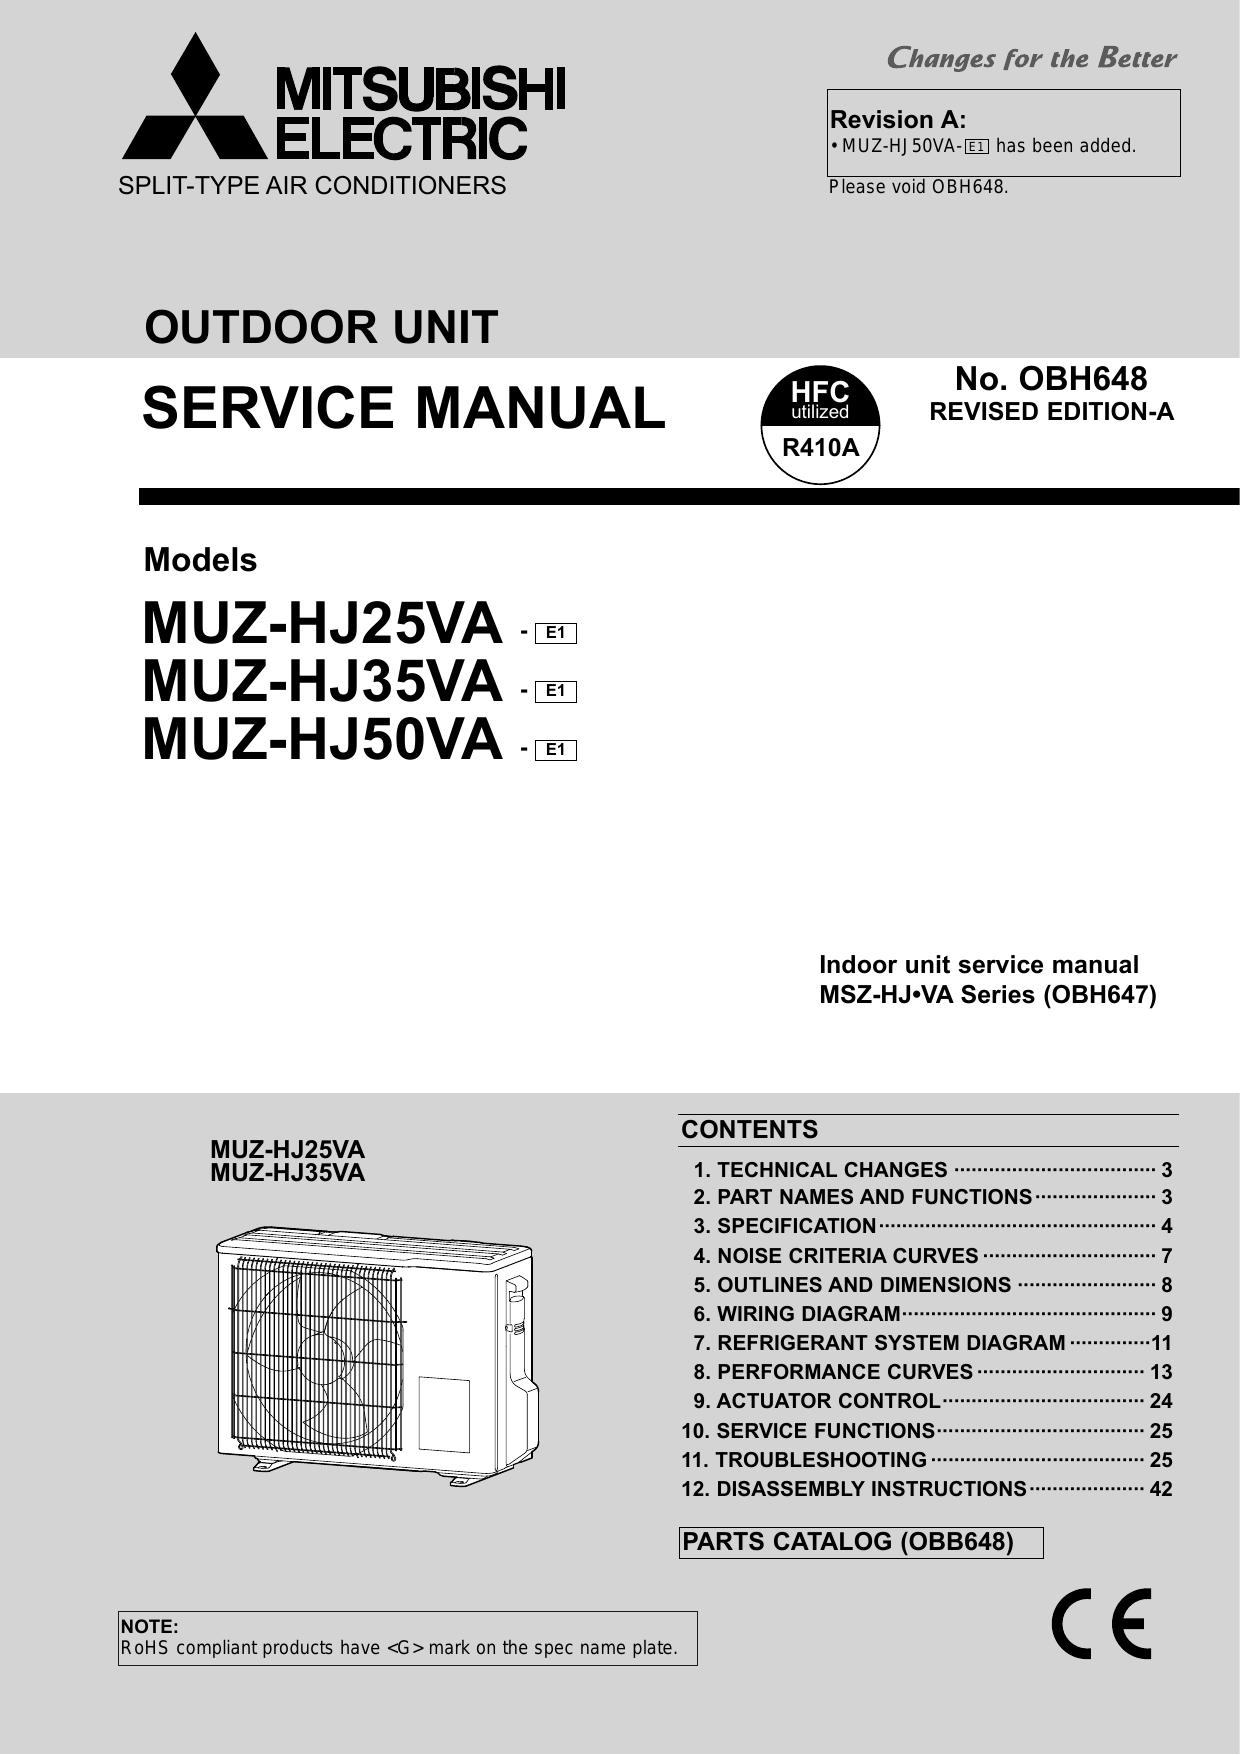 mitsubishi electric msz hj35va e1 service manual manualzz com rh manualzz com